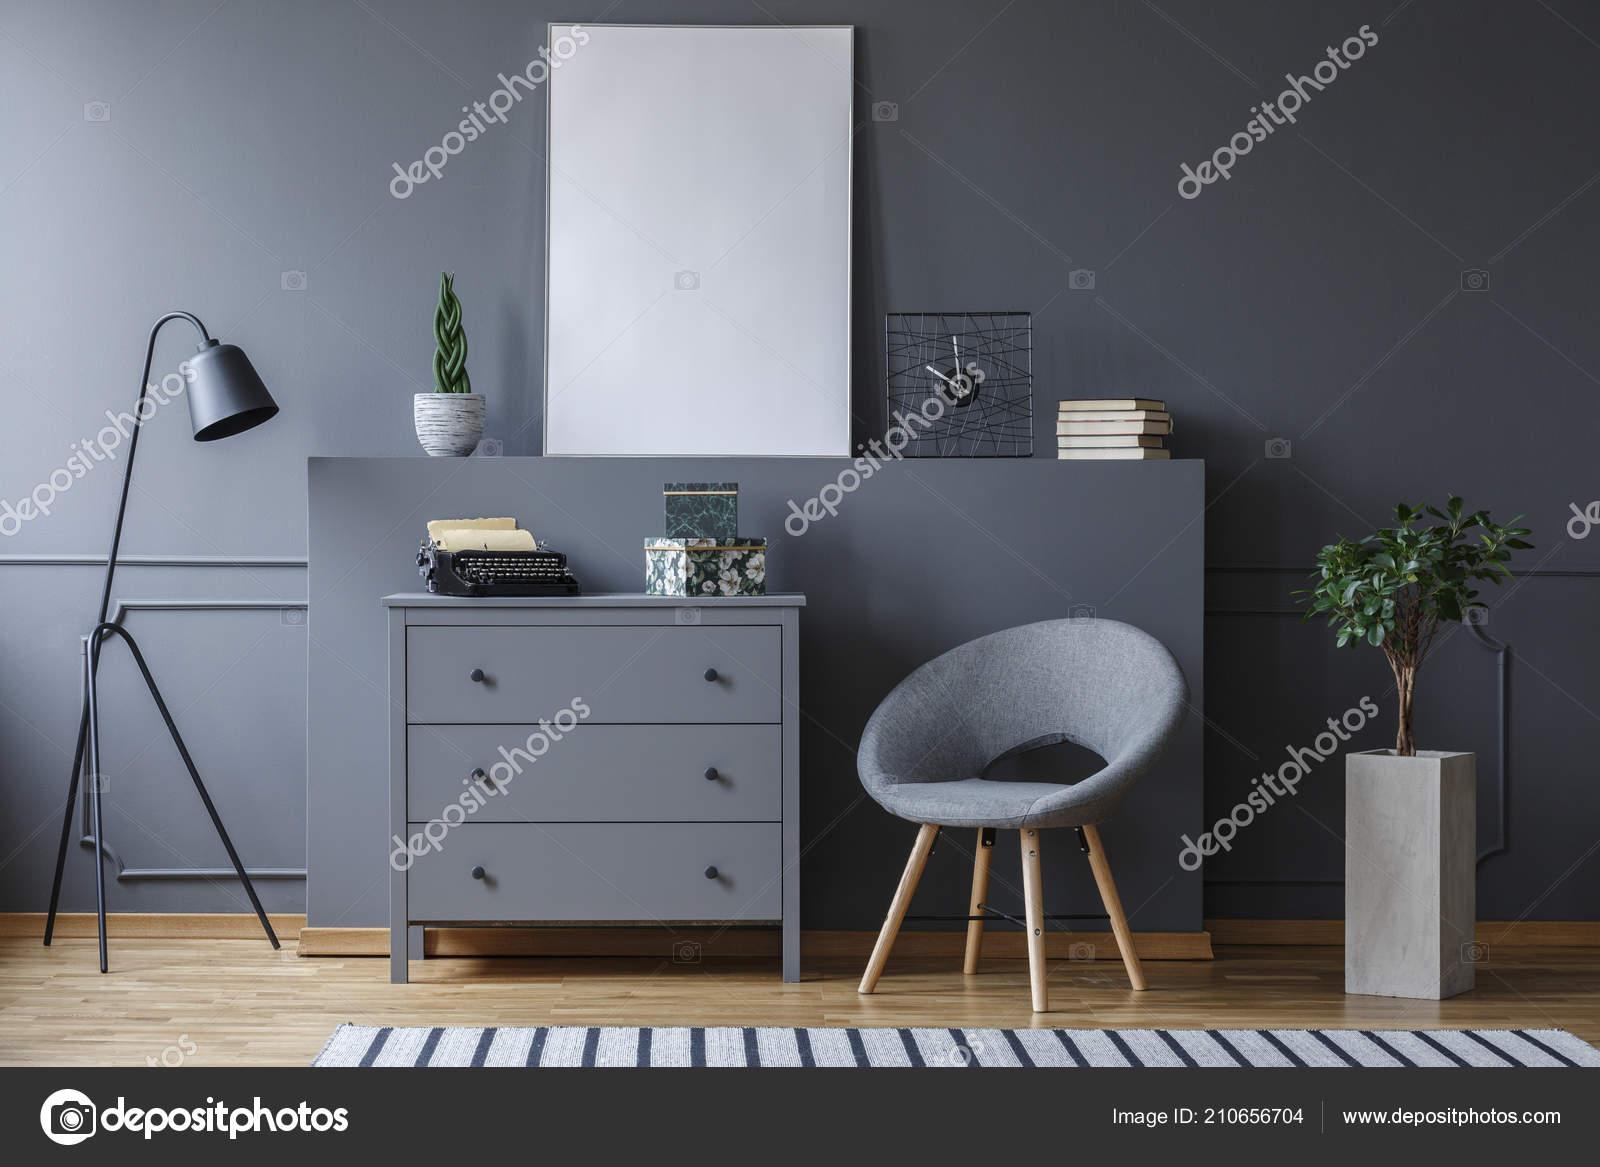 Armchair Next Cabinet Grey Living Room Interior Mockup Poster Lamp Stock Photo C Photographee Eu 210656704